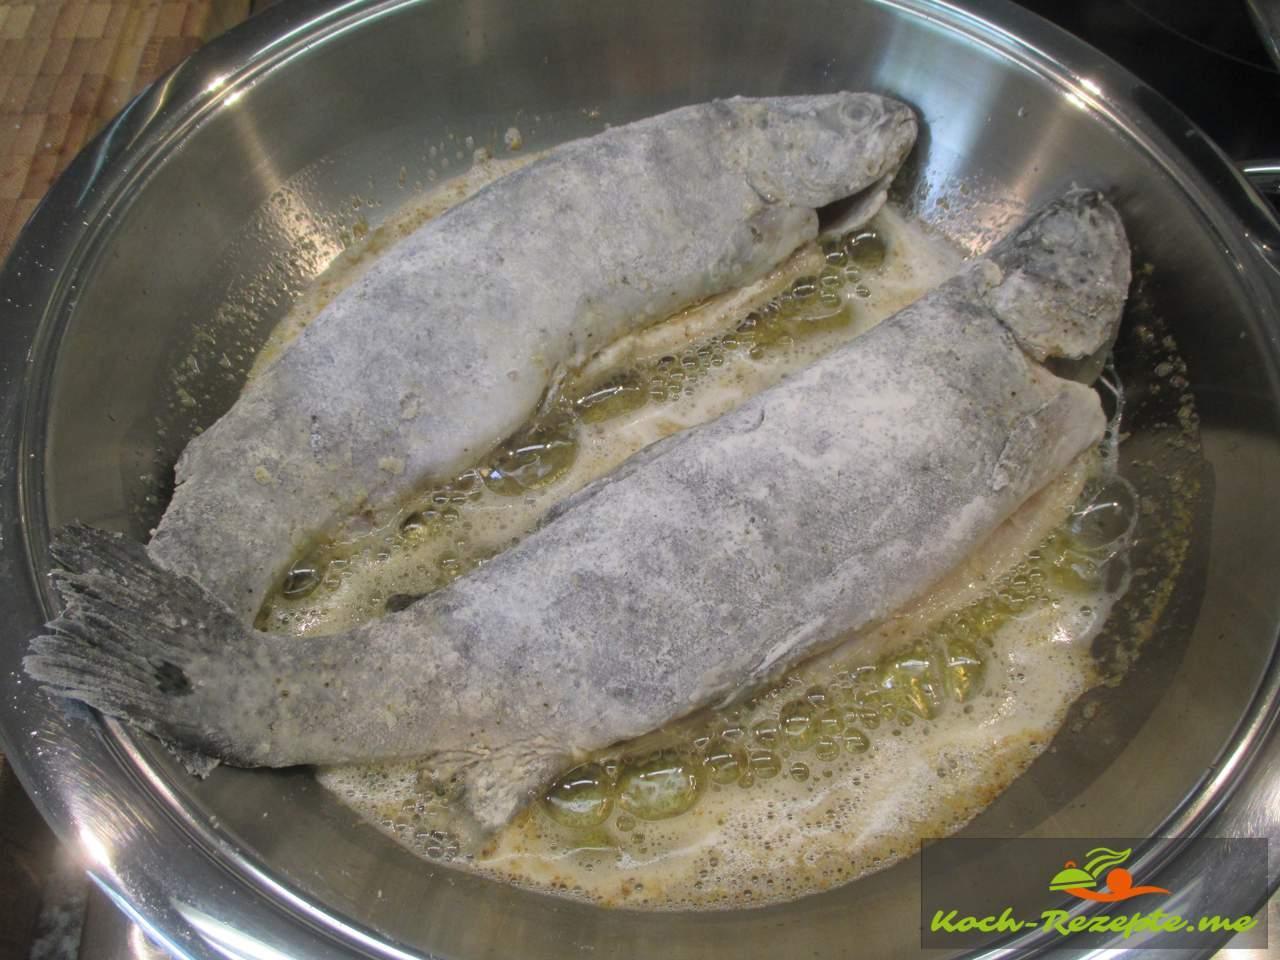 bemehlte Forellen ausbacken in Butterschmalz 2x 6 Minuten